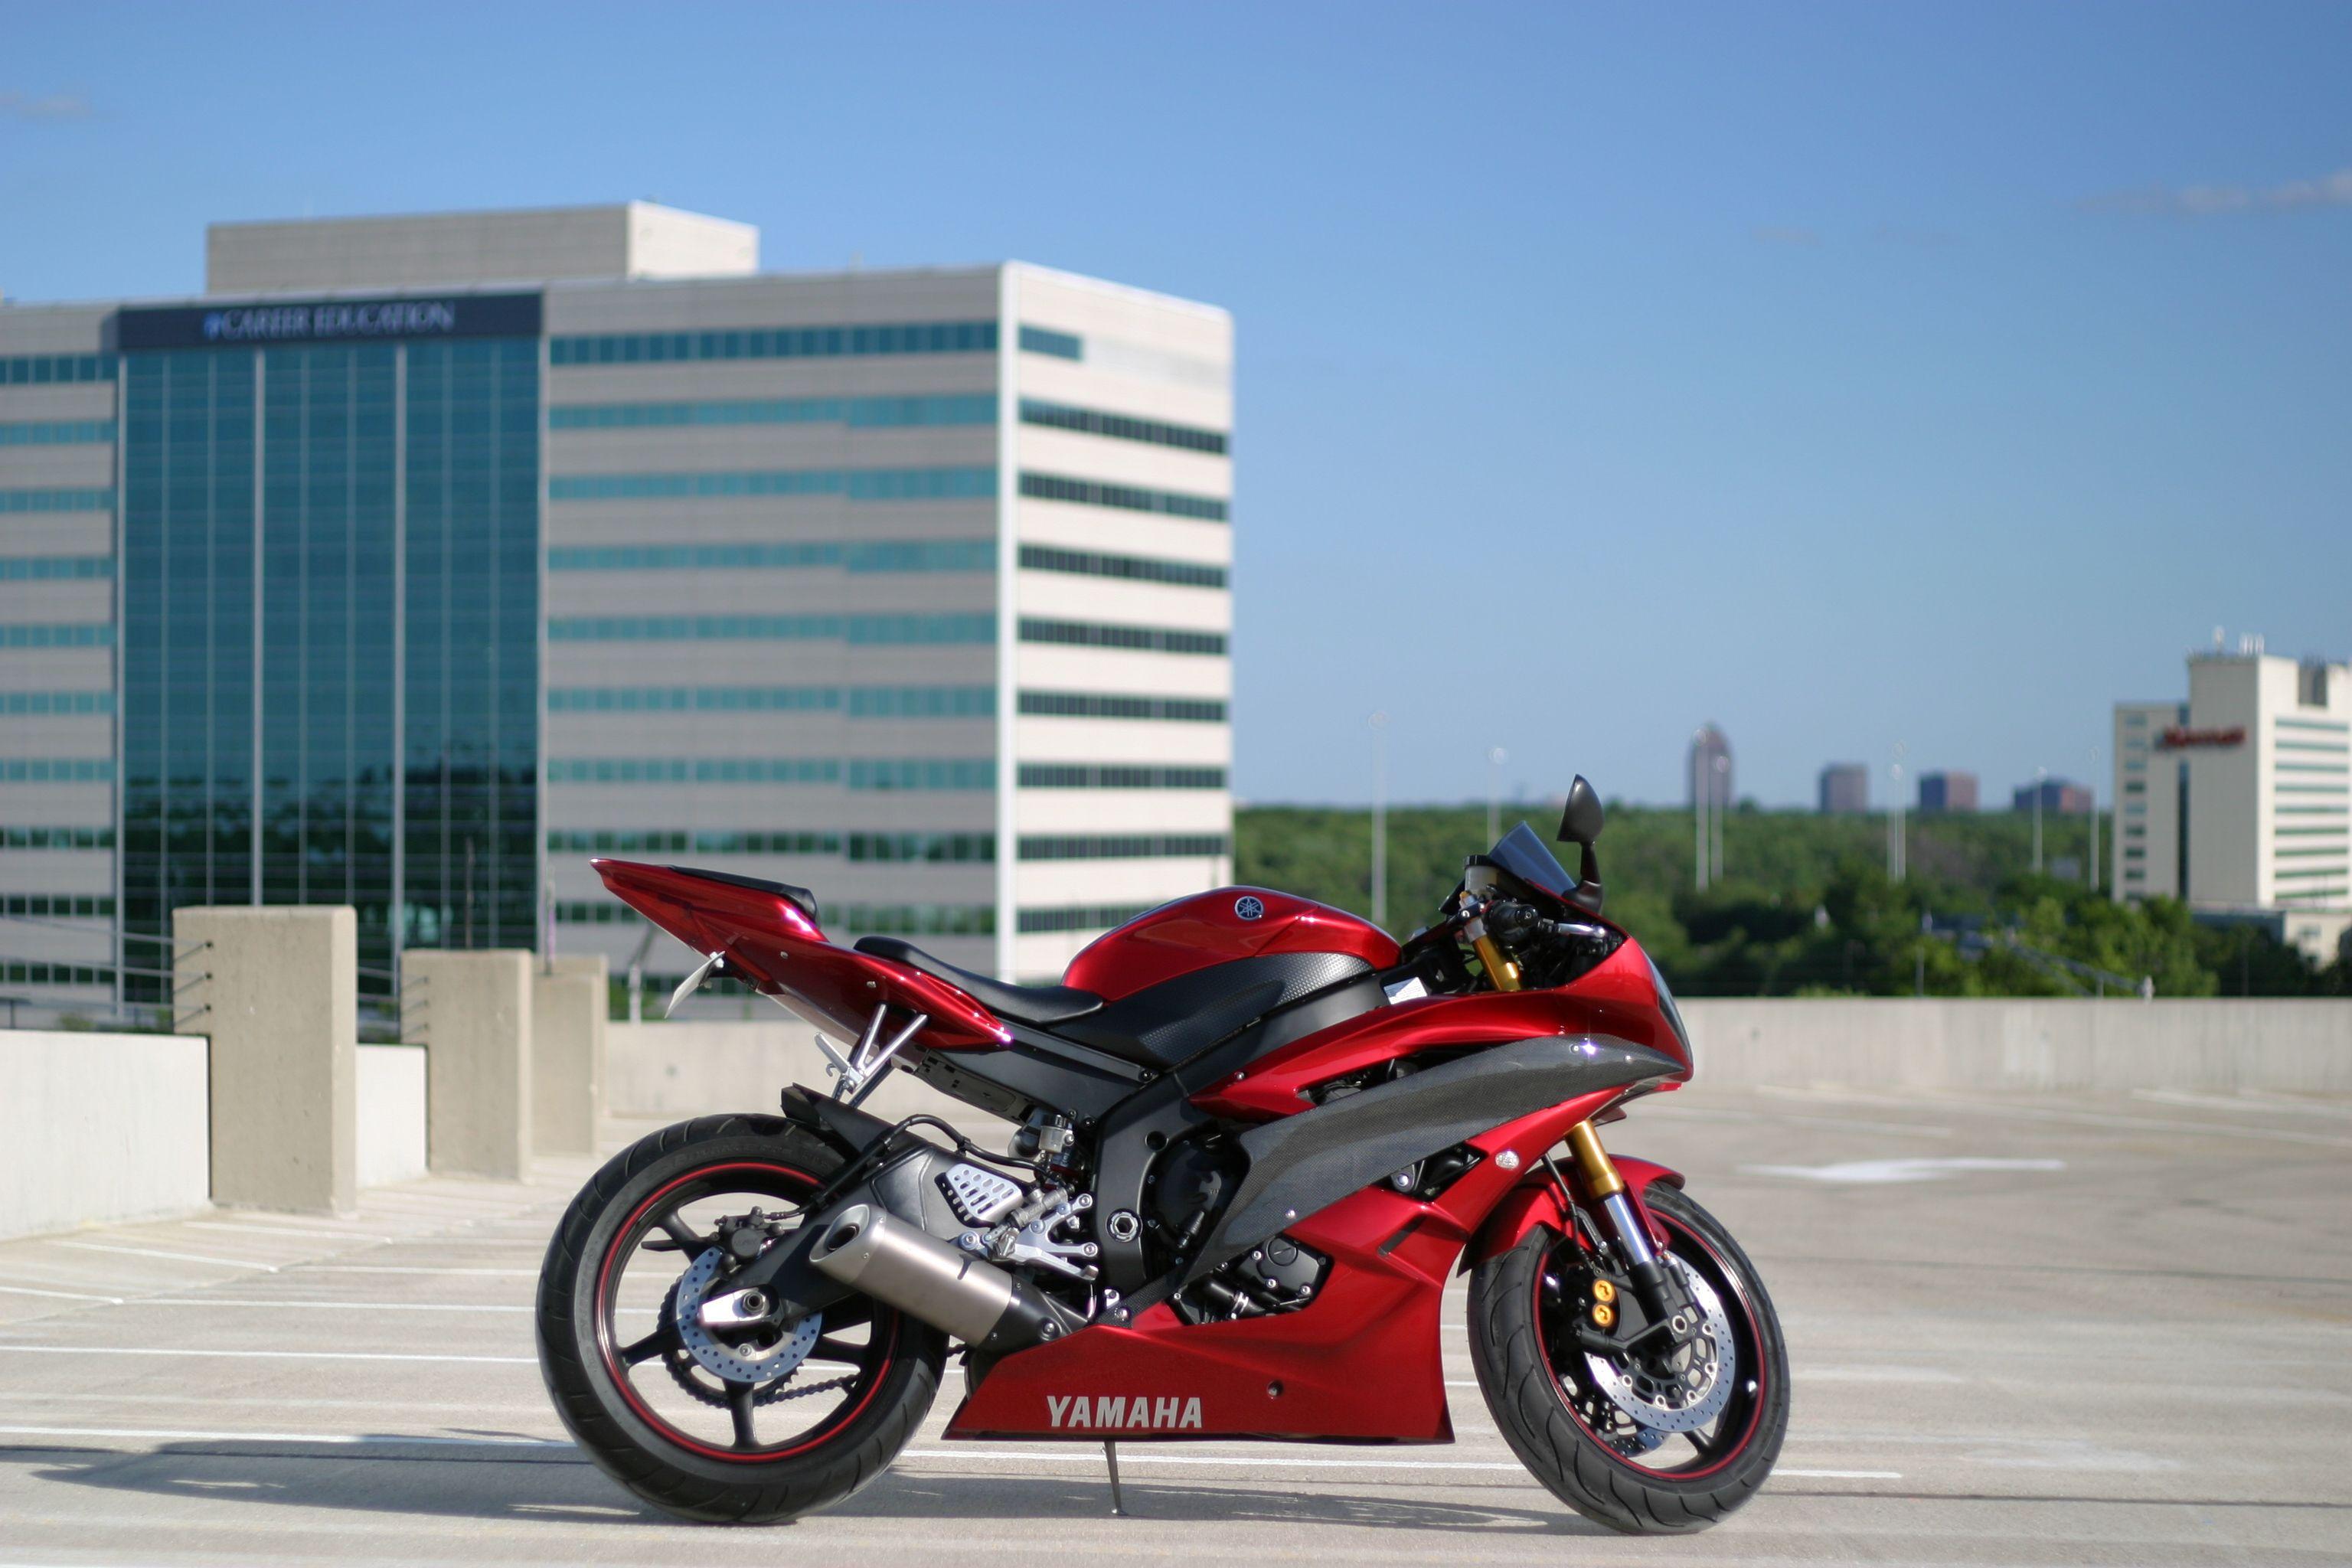 Yamaha R6 I want this same bike!